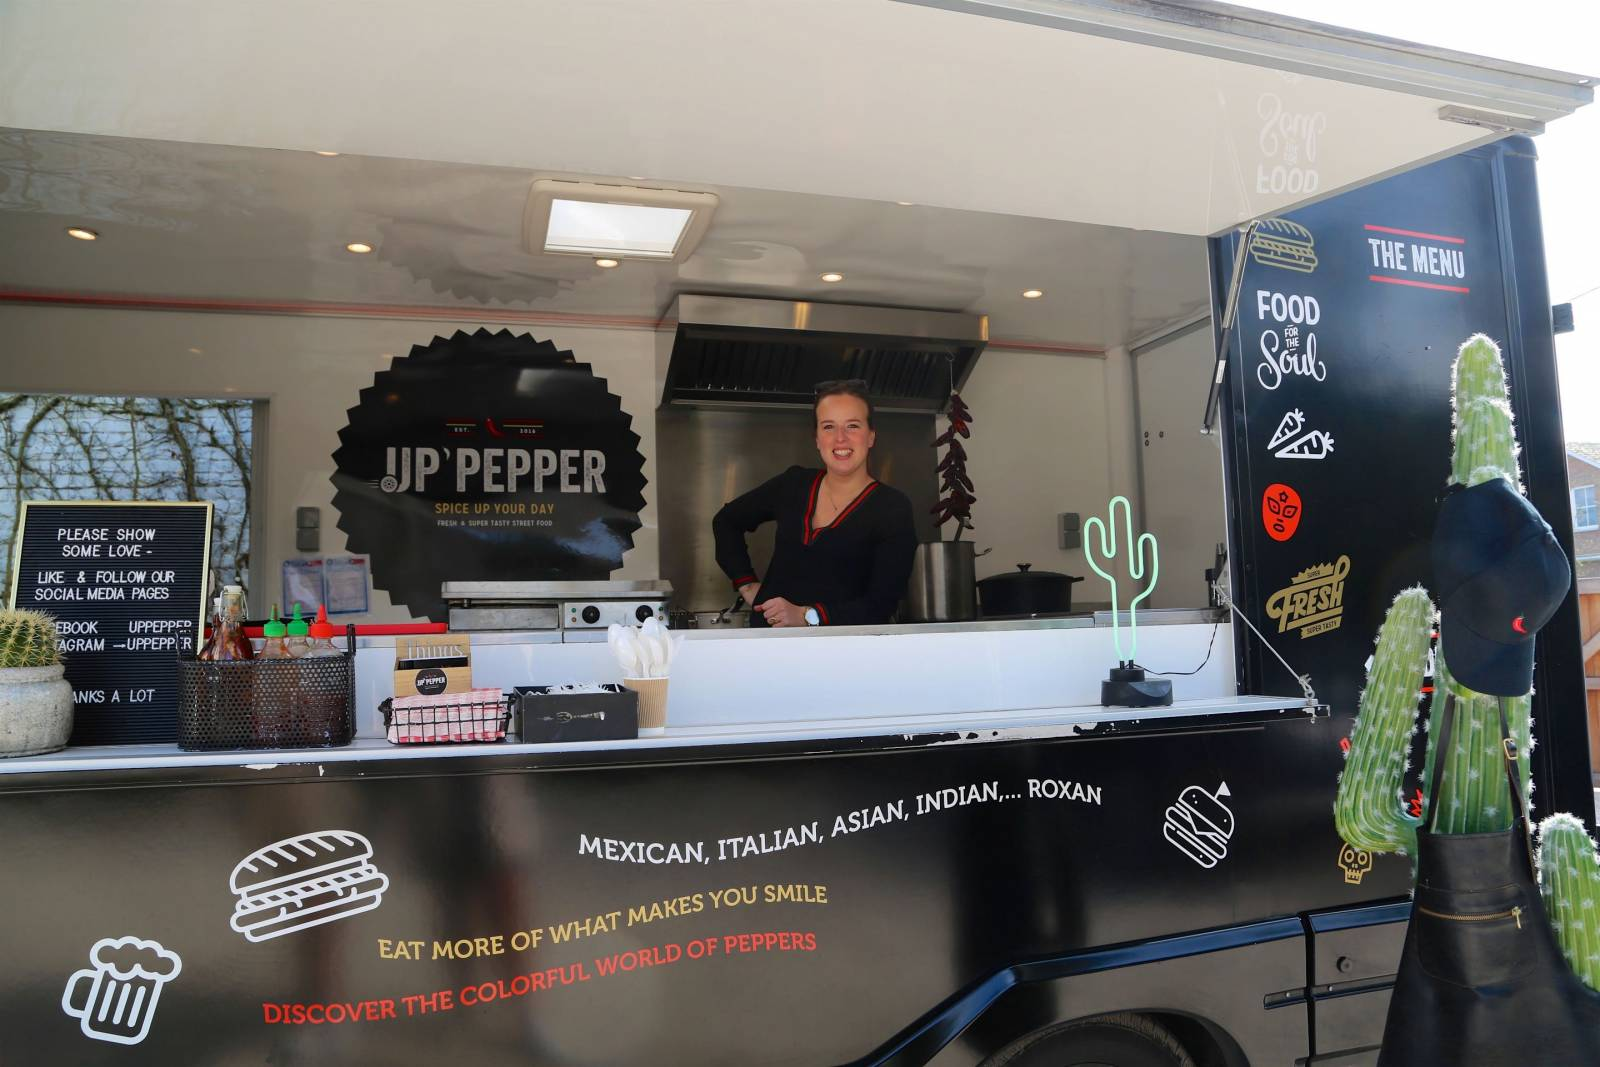 Up Pepper - foodtruck - House of Weddings 2 - 2